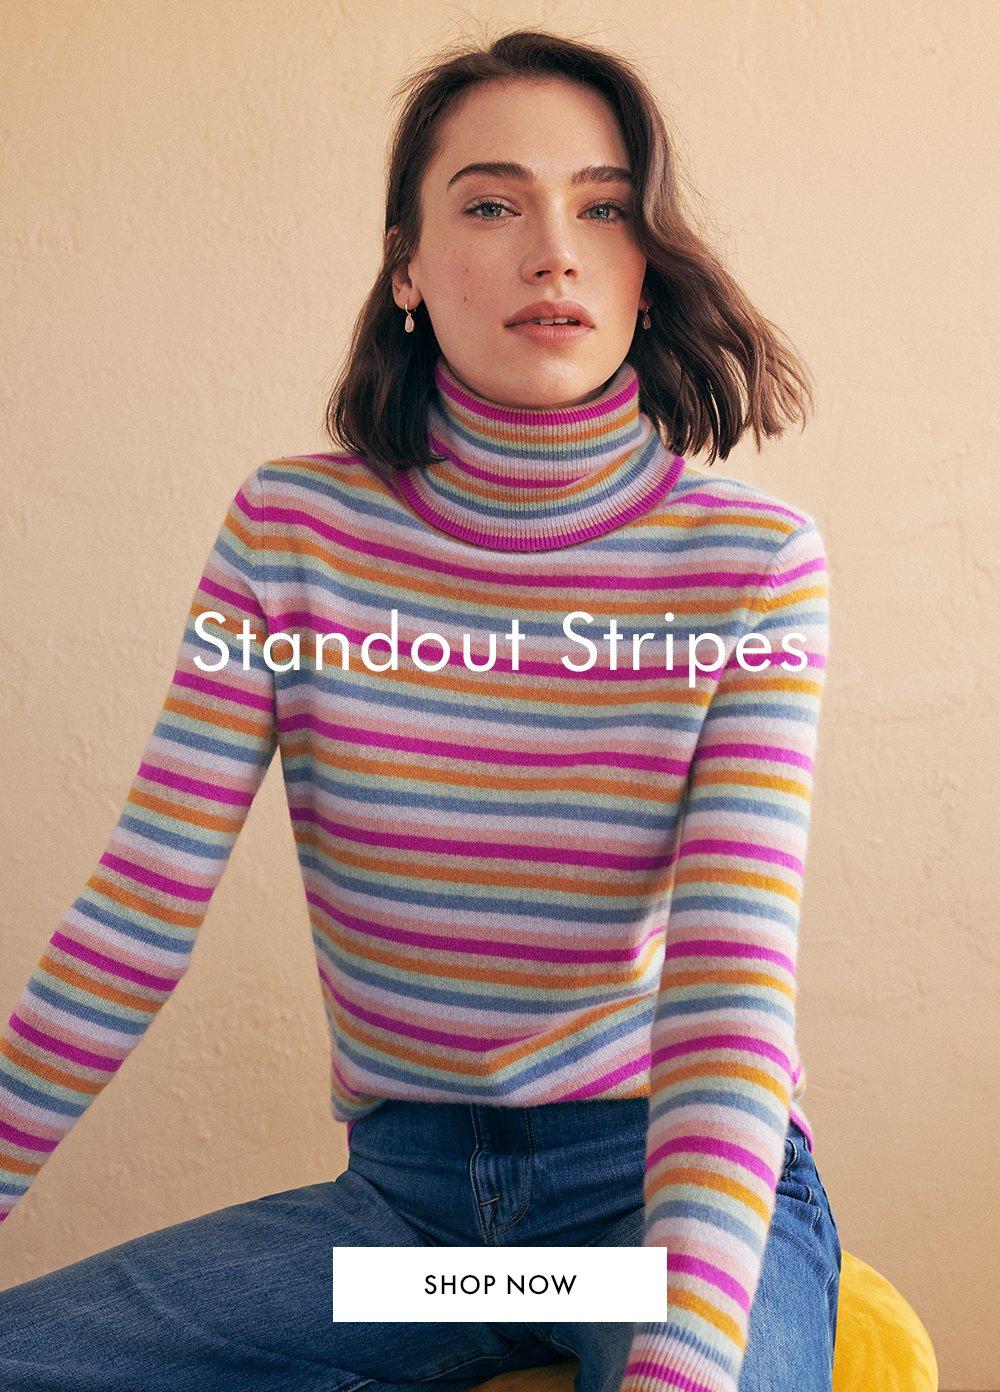 Standout Stripes